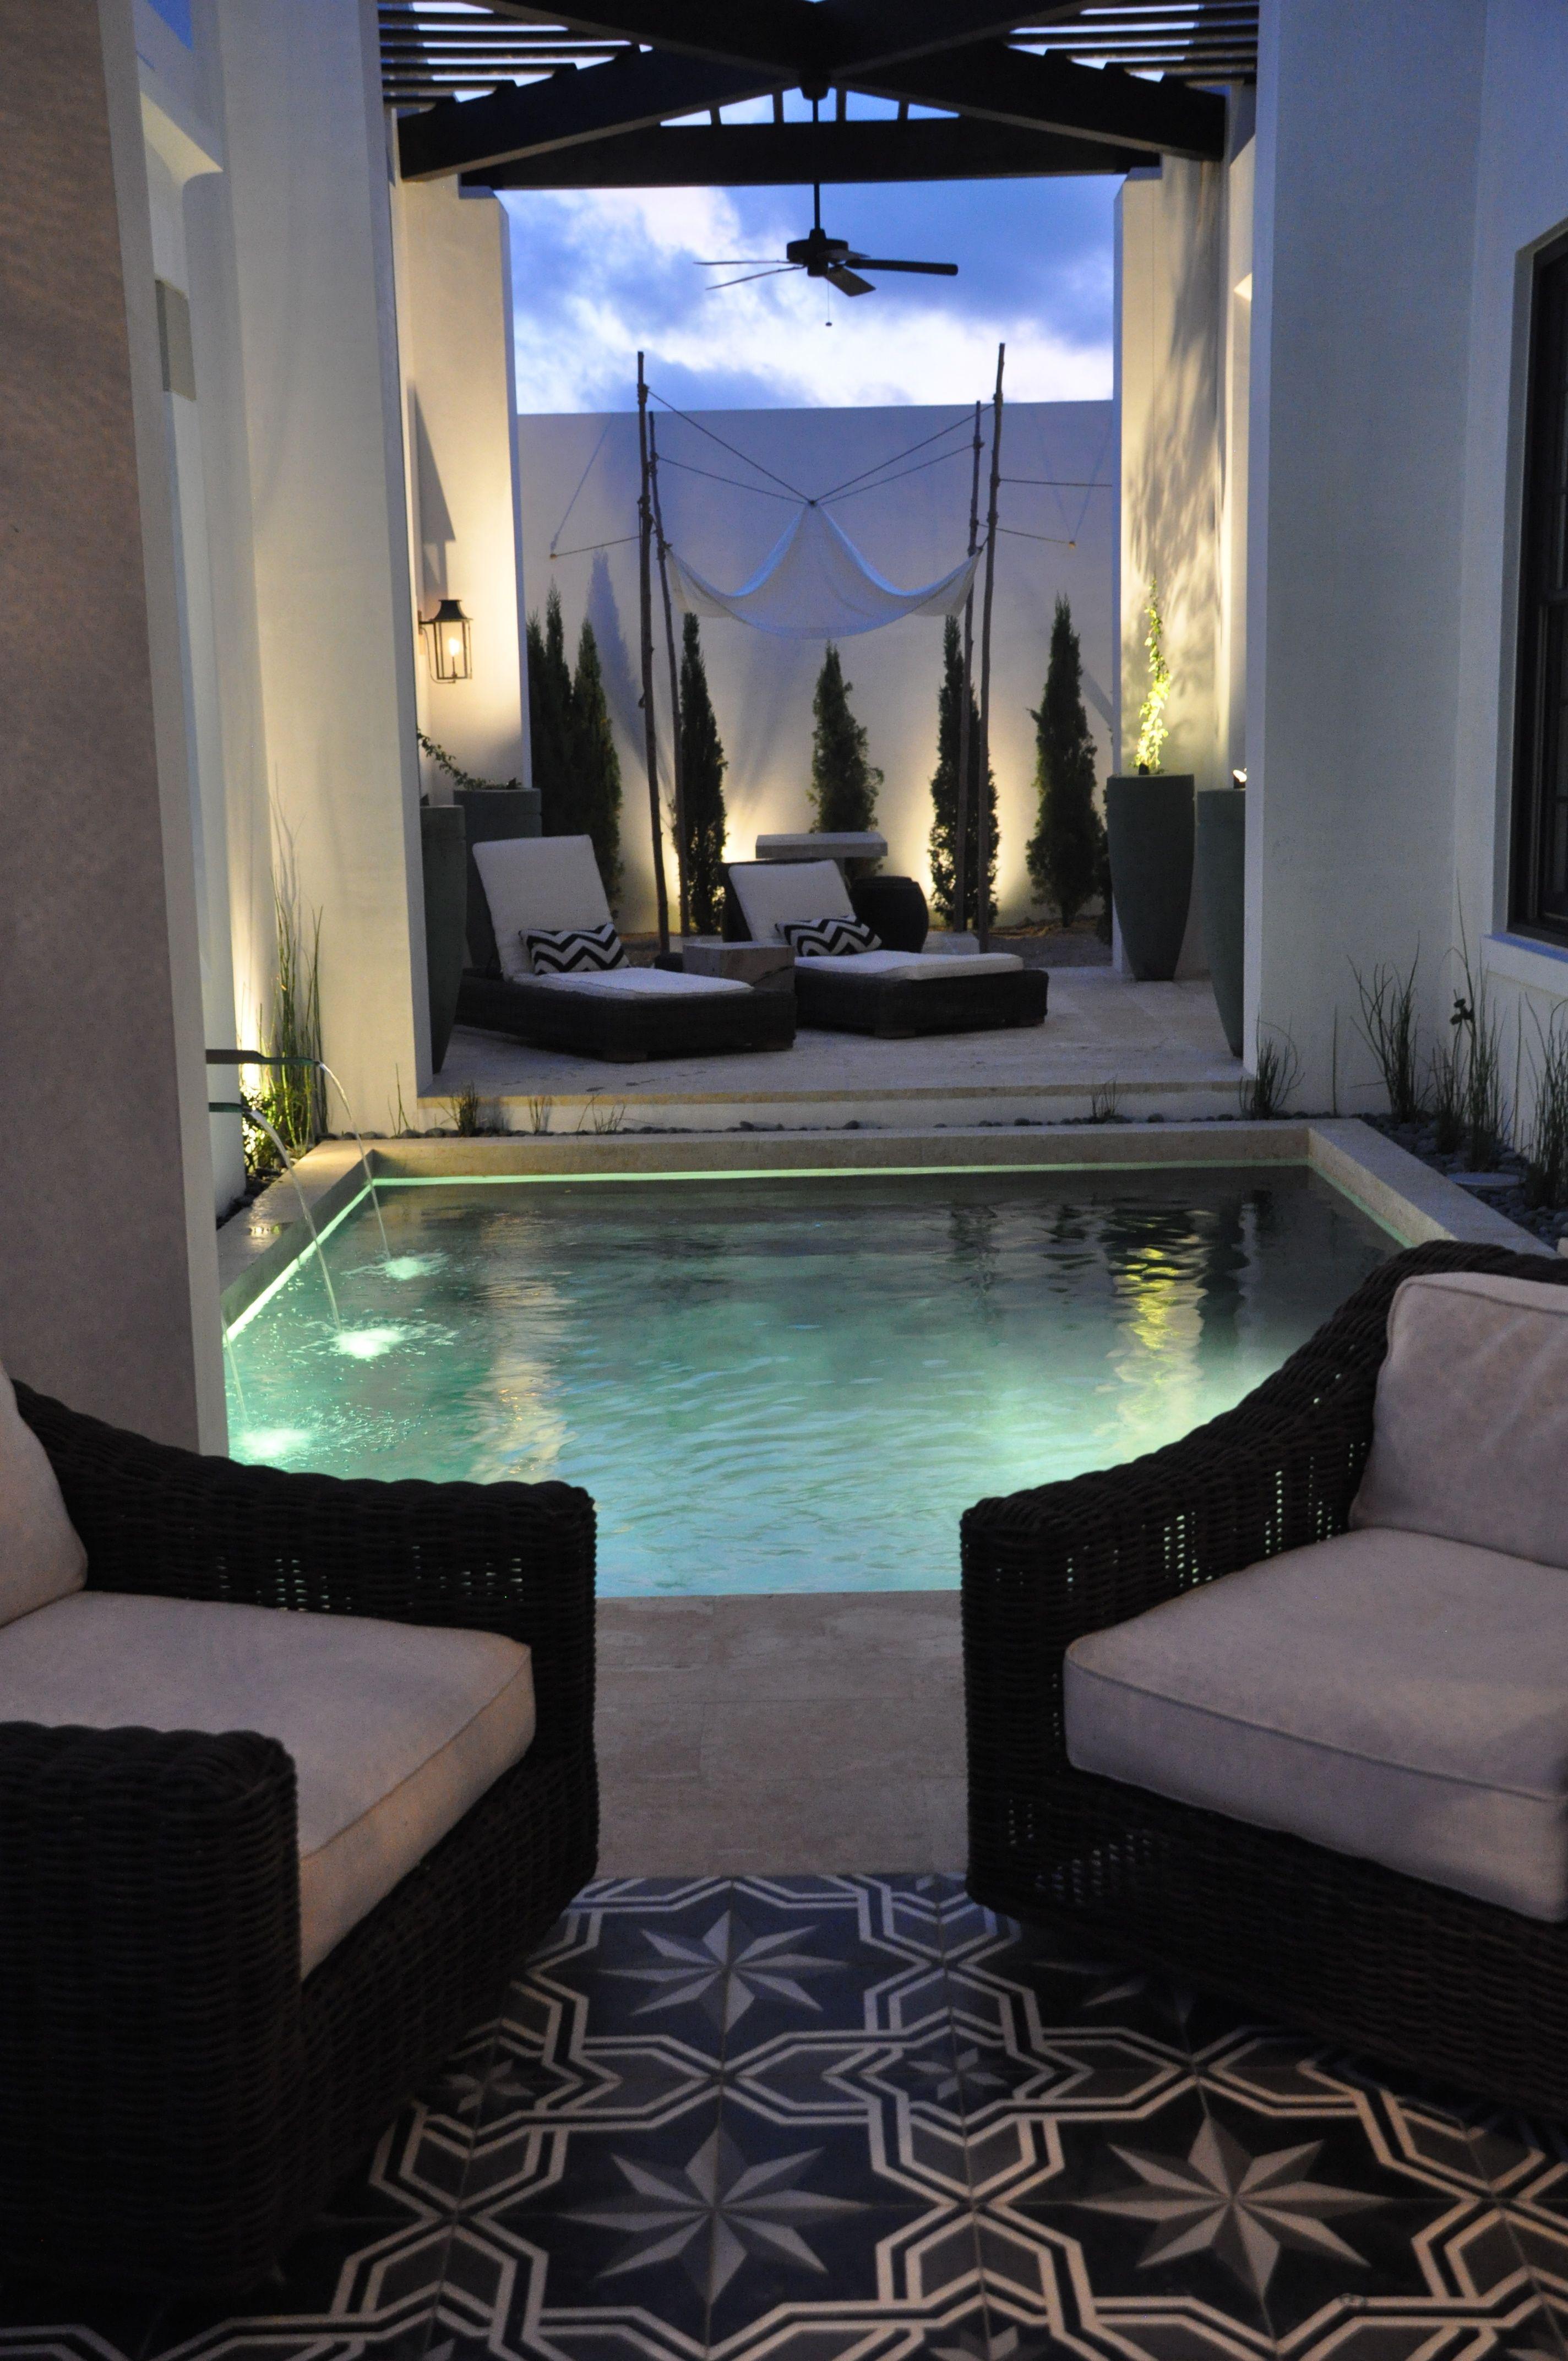 Best Kitchen Gallery: Dark Indulgence Black Bathtubs Private Pool Small Swimming Pools of Pools Of Light Interior Design on rachelxblog.com